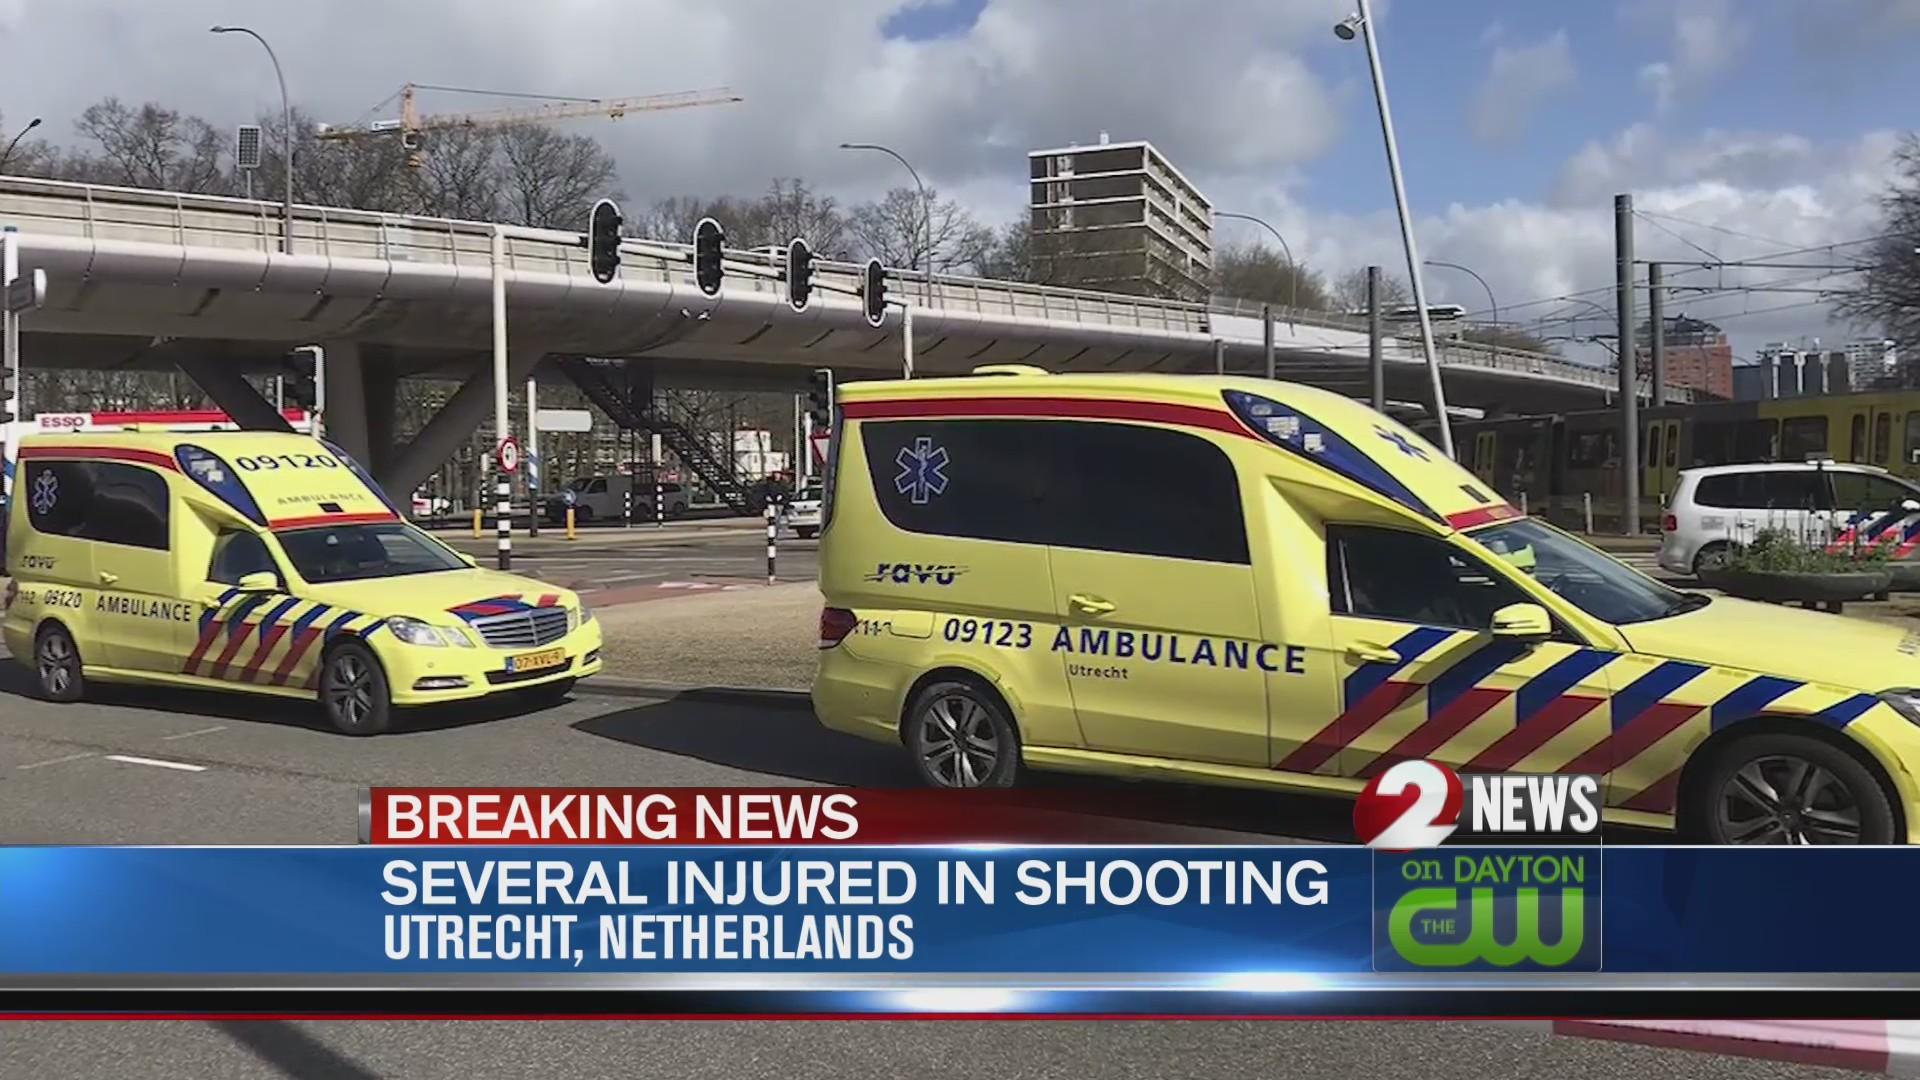 Dutch police considering terrorism in shooting